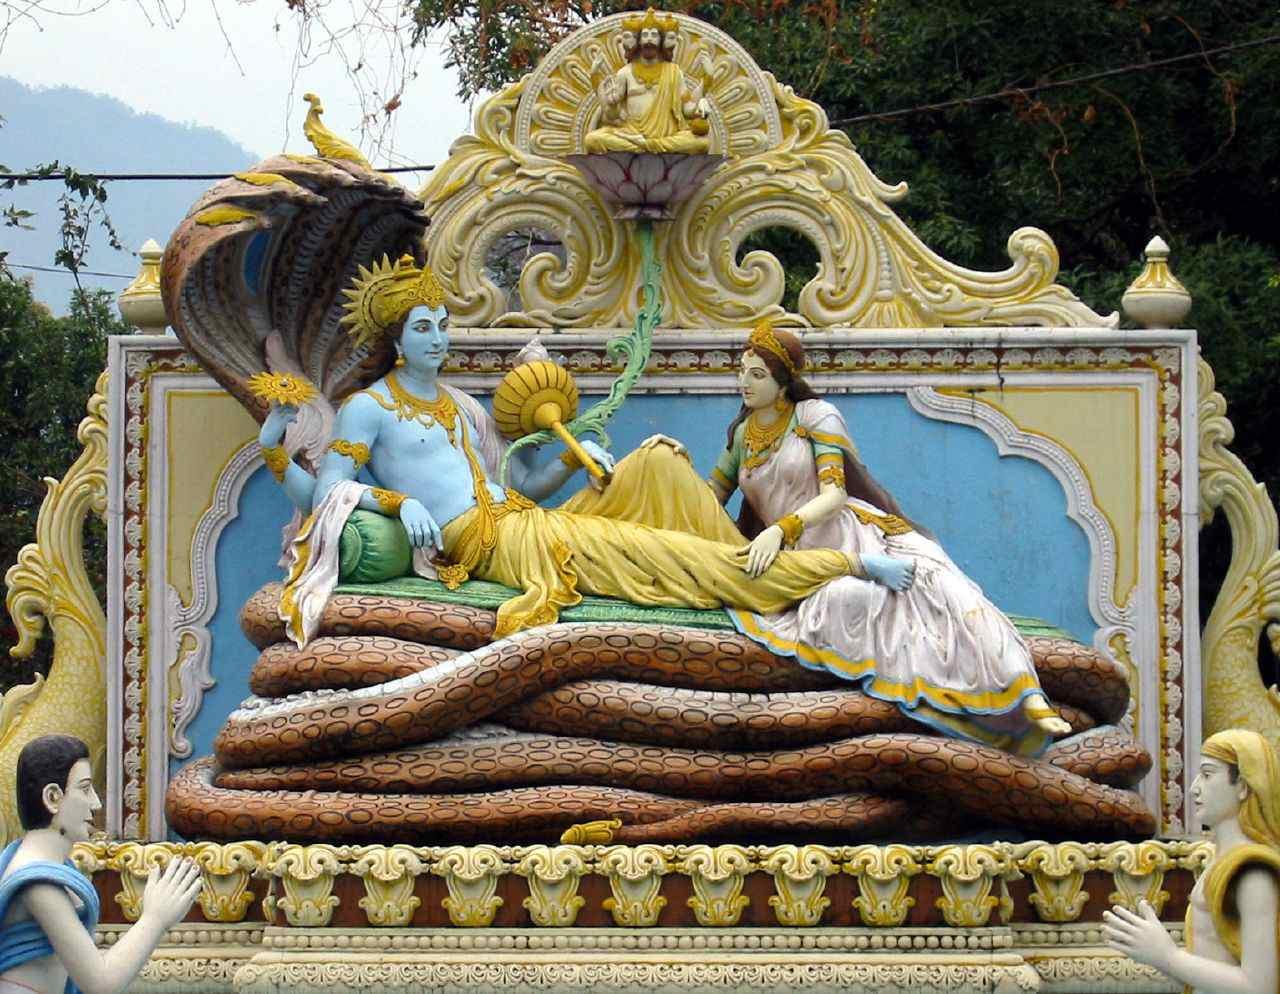 The Hindu God Vishnu with his consort Lakshmi resting on Sheshnag.